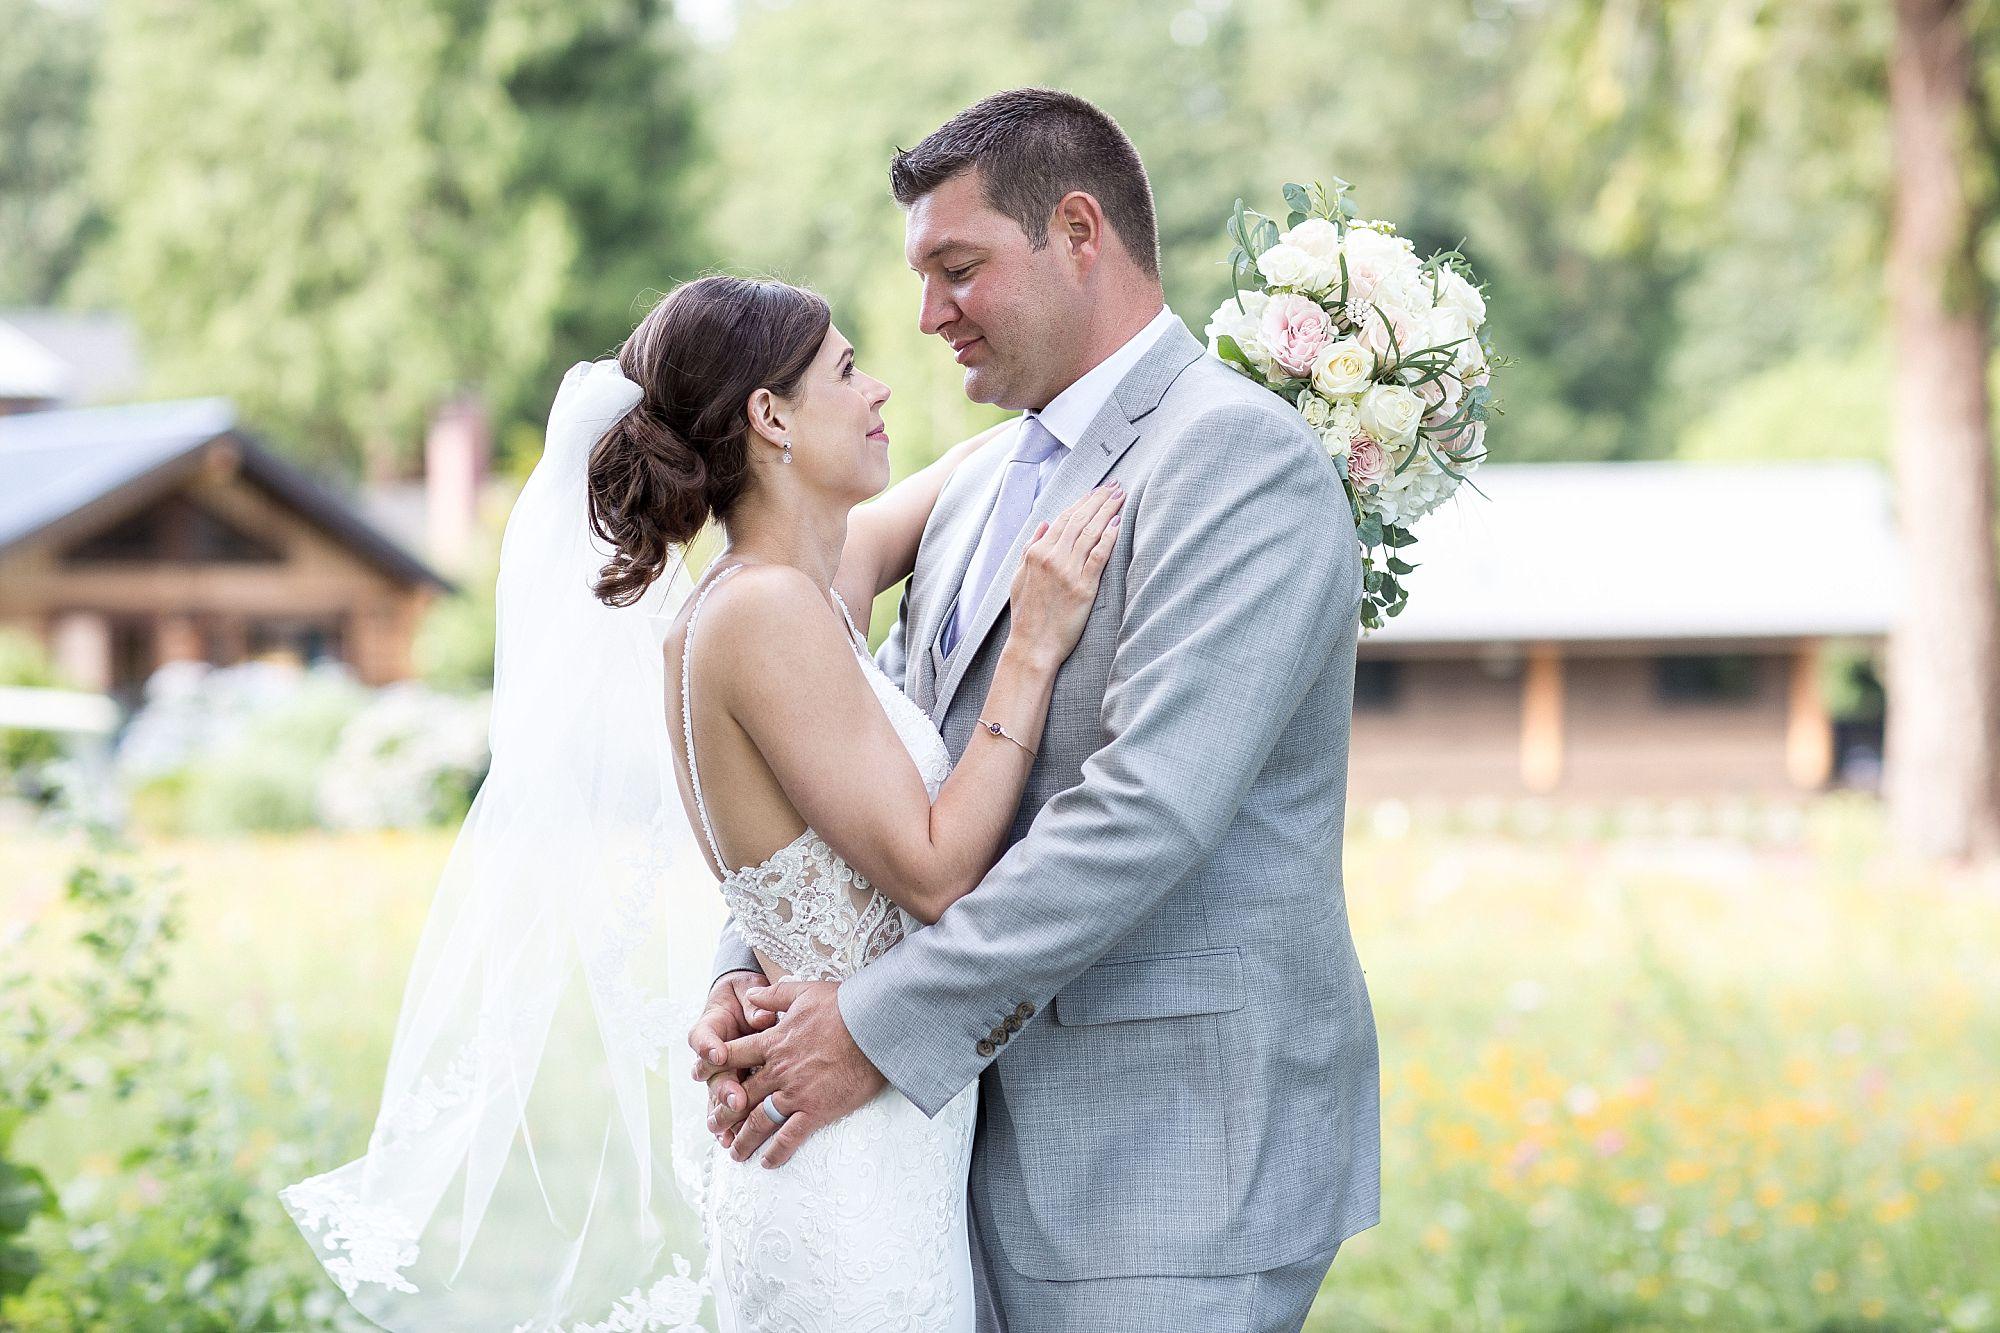 Vancouver Wedding Photography Hayley Rae Photography Associate_0012.jpg